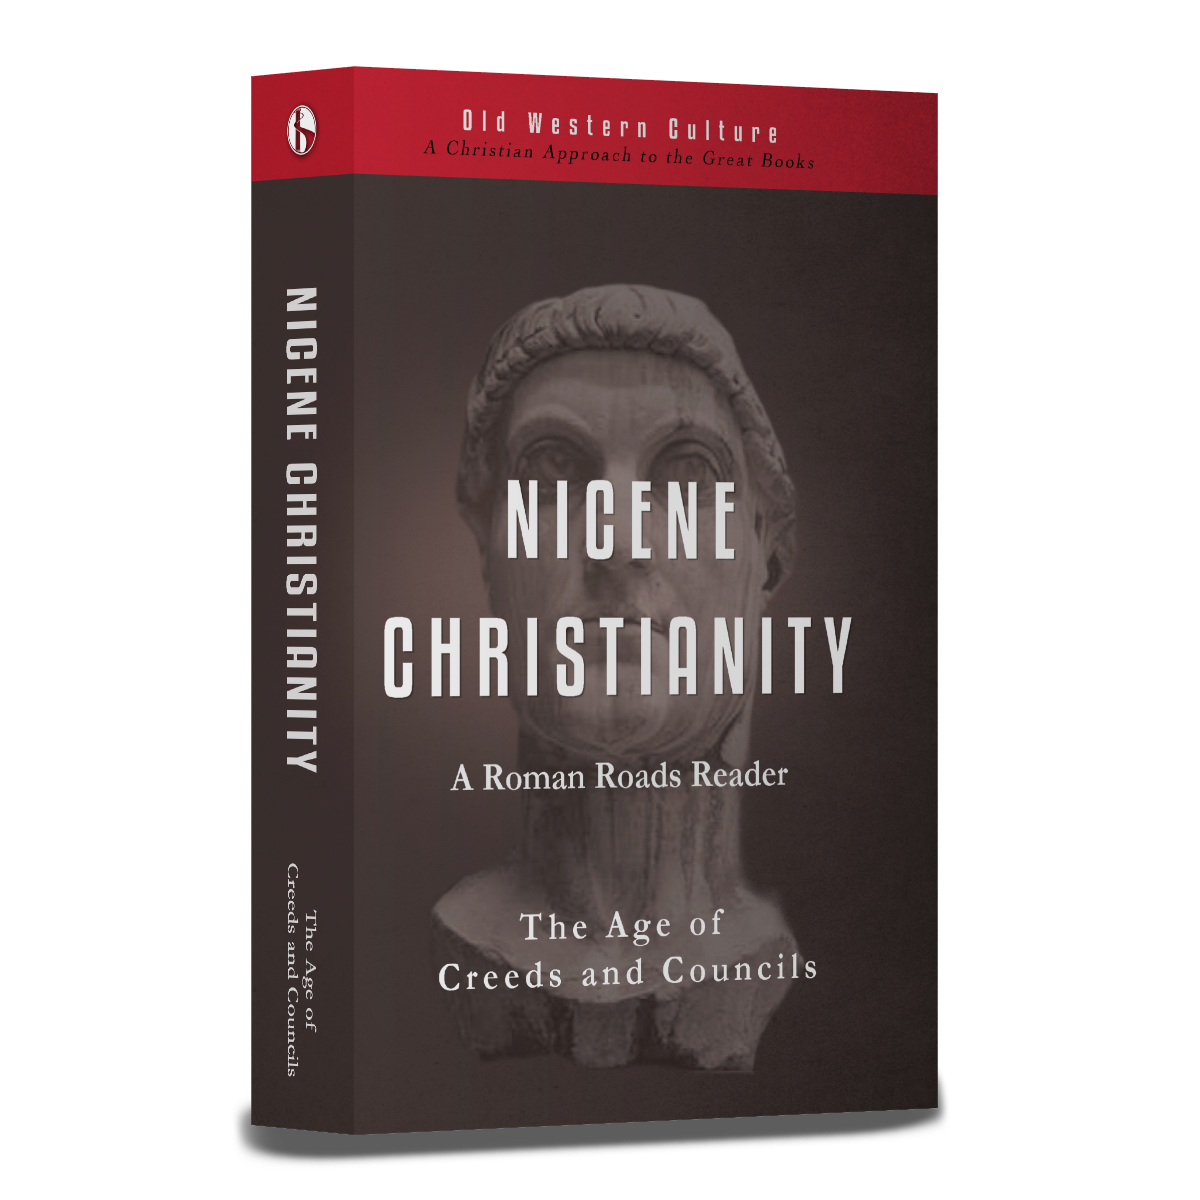 Y2 Q4: Nicene Christianity